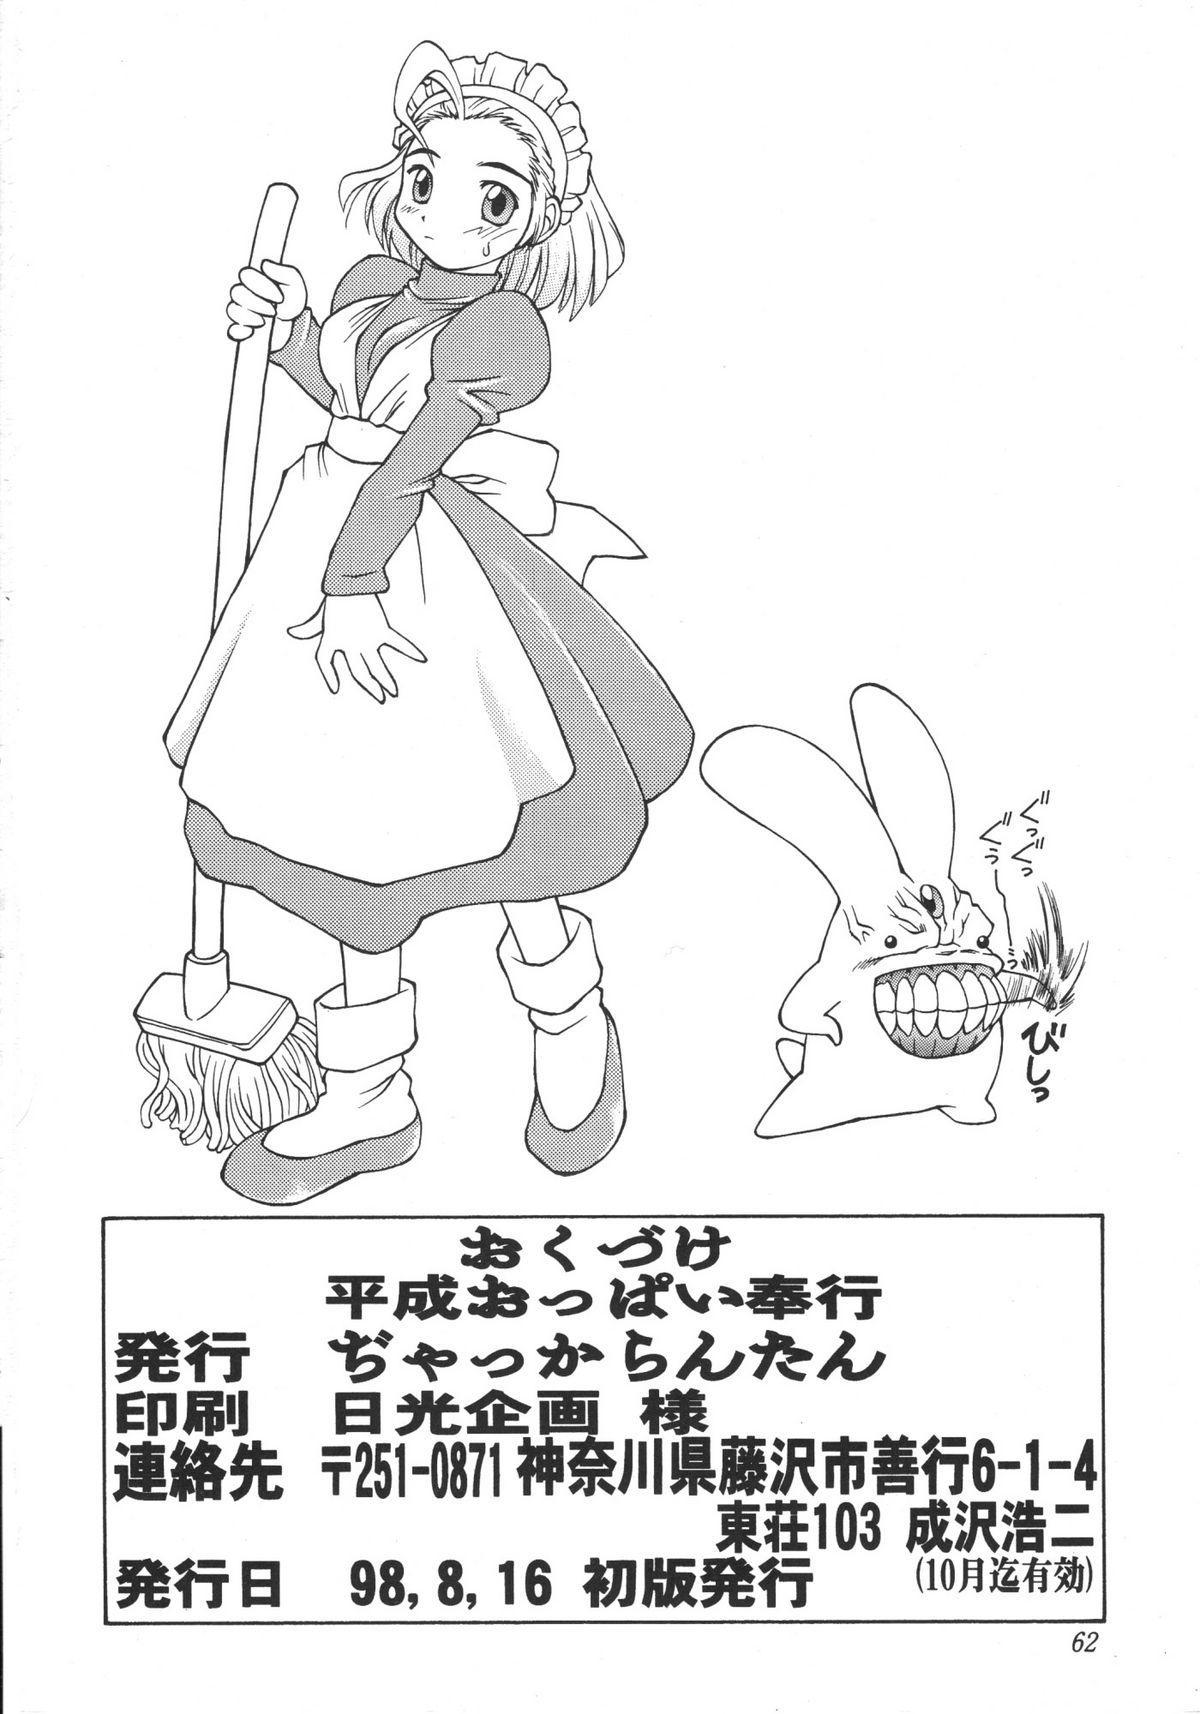 Heisei Oppai Bugyou 62